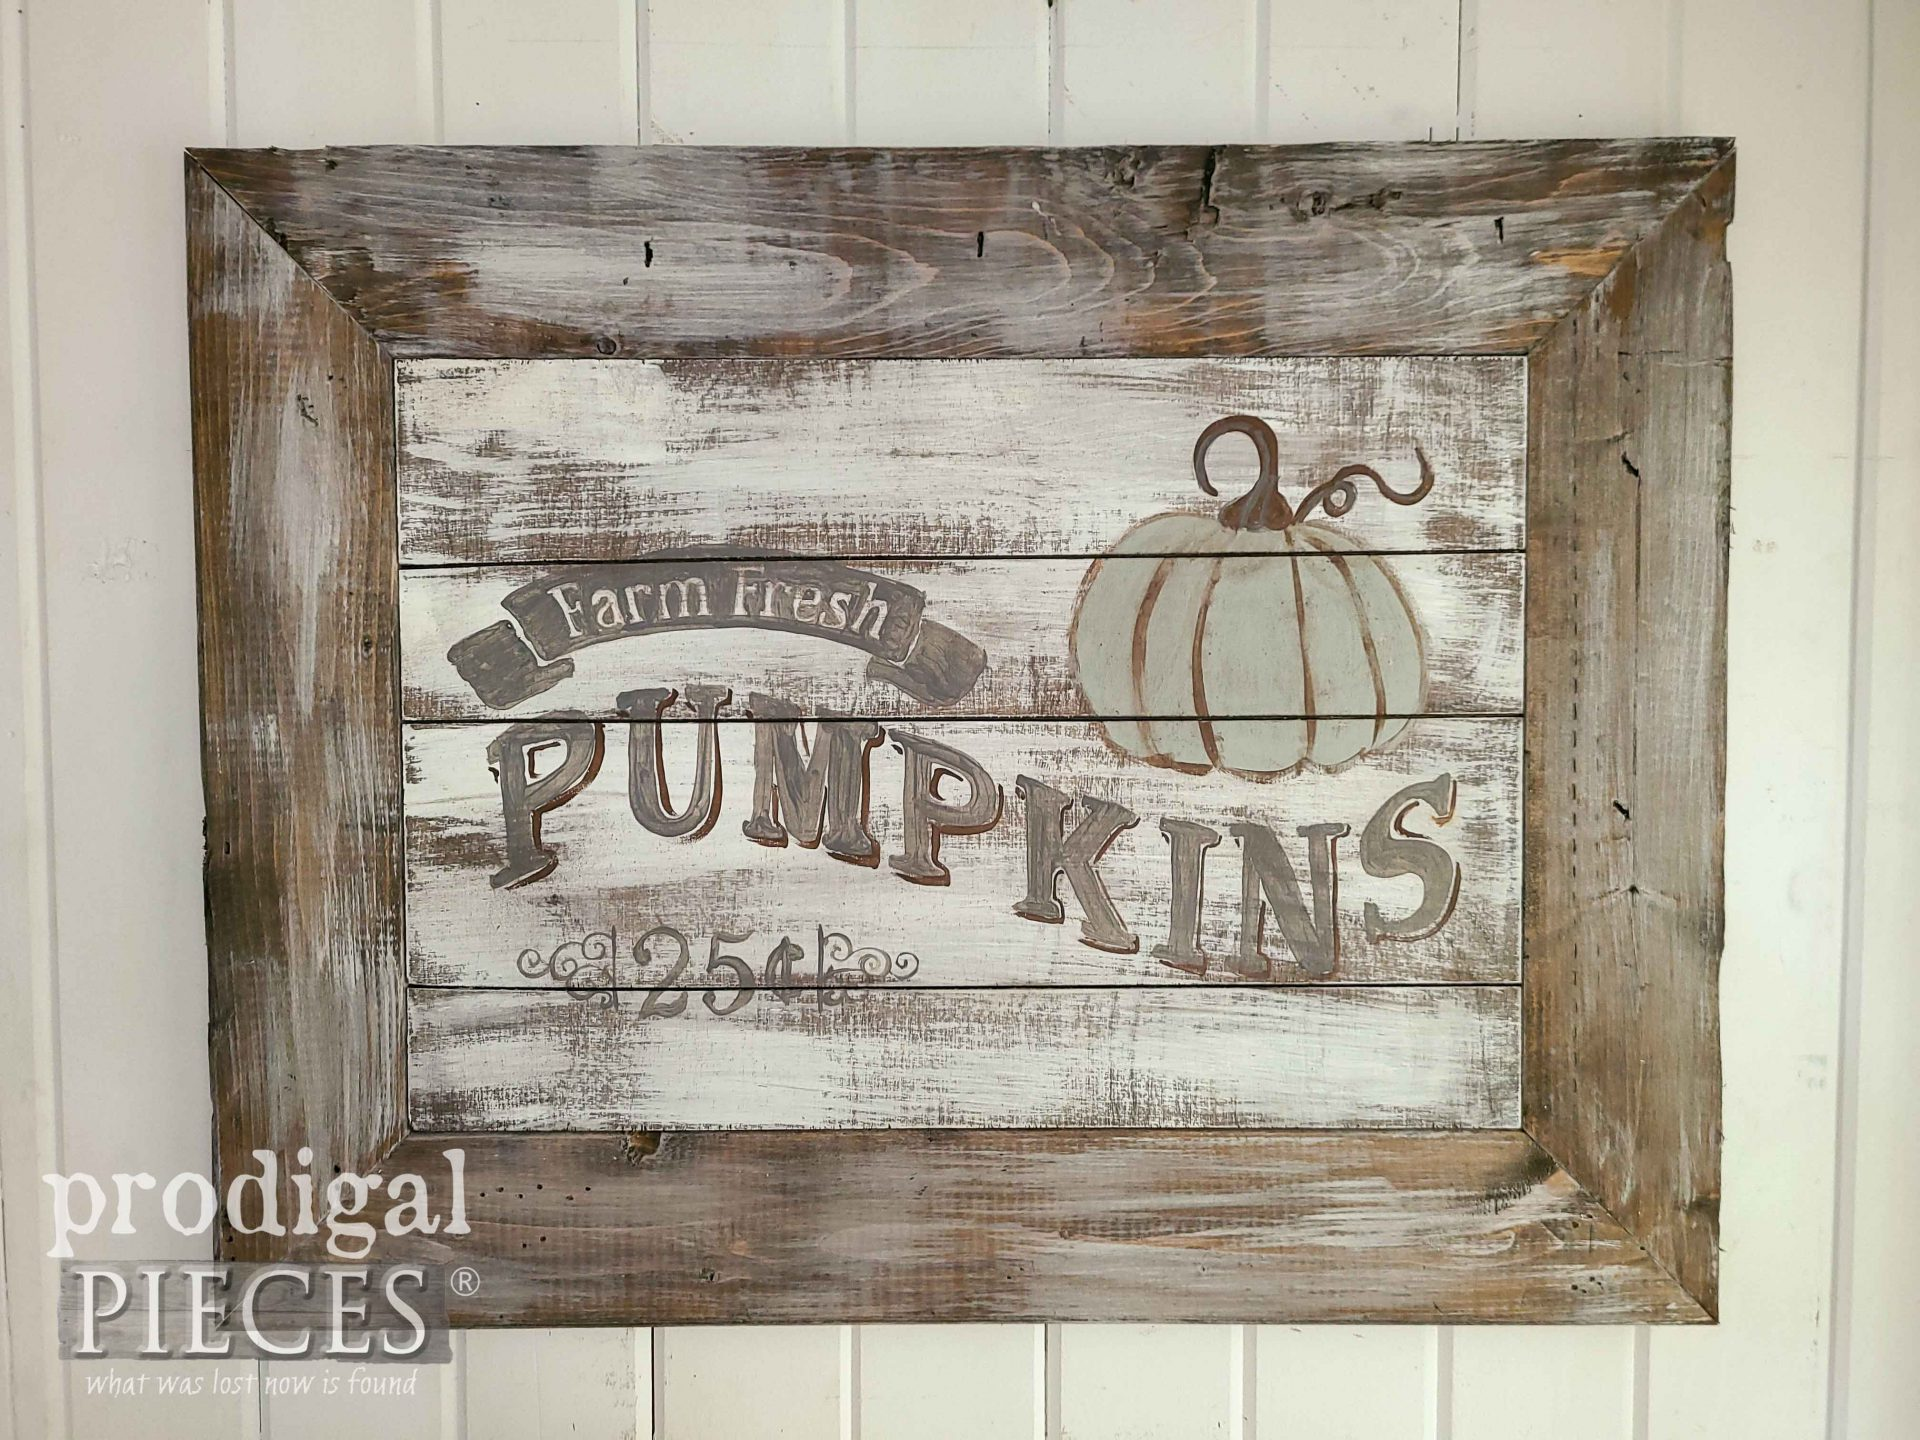 Farmhouse Chic DIY Harvest Sign by Larissa of Prodigal Pieces | prodigalpieces.com #prodigalpieces #diy #home #homedecor #farmhouse